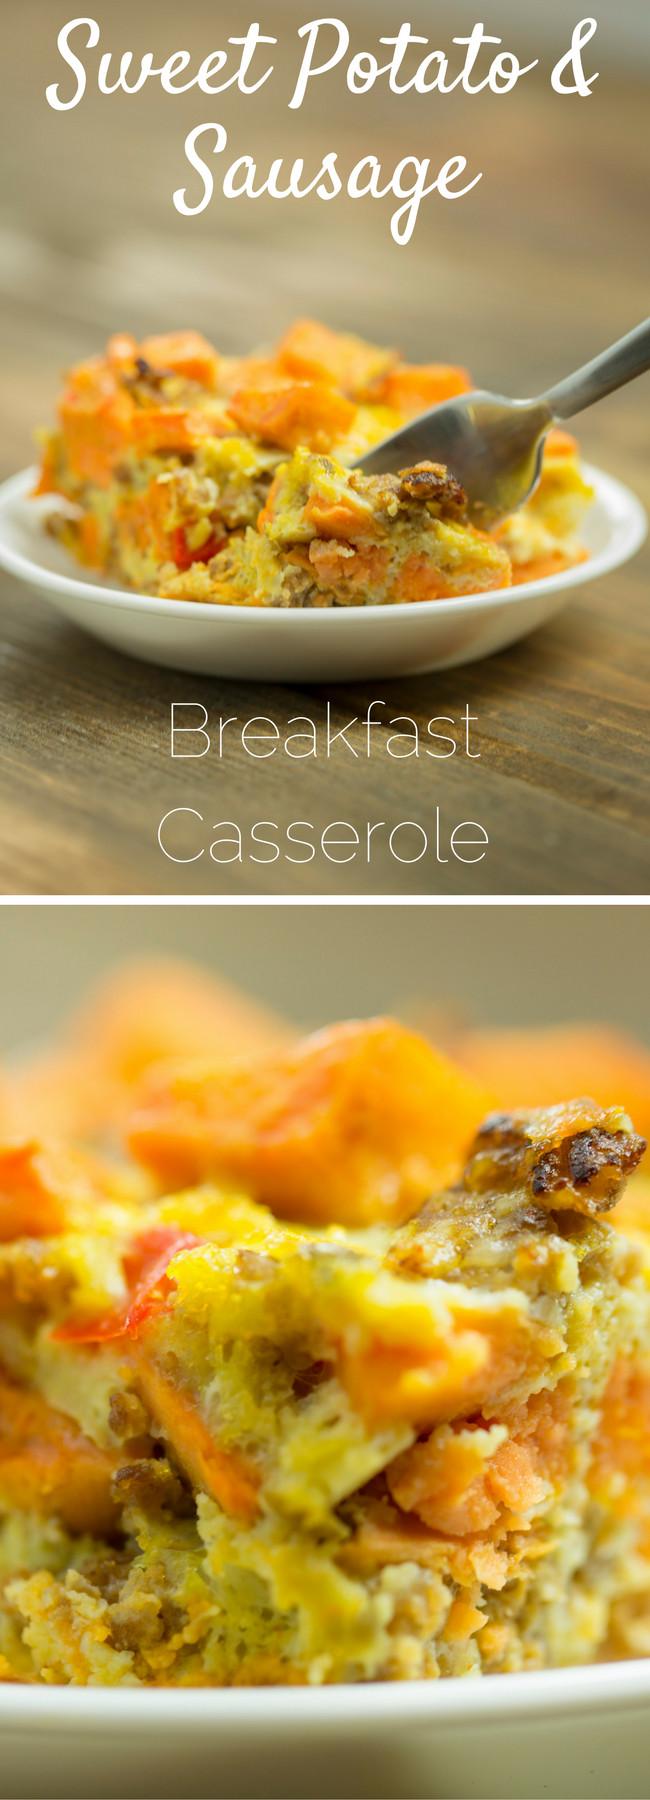 Healthy Breakfast Casserole With Sausage  Paleo Breakfast Casserole